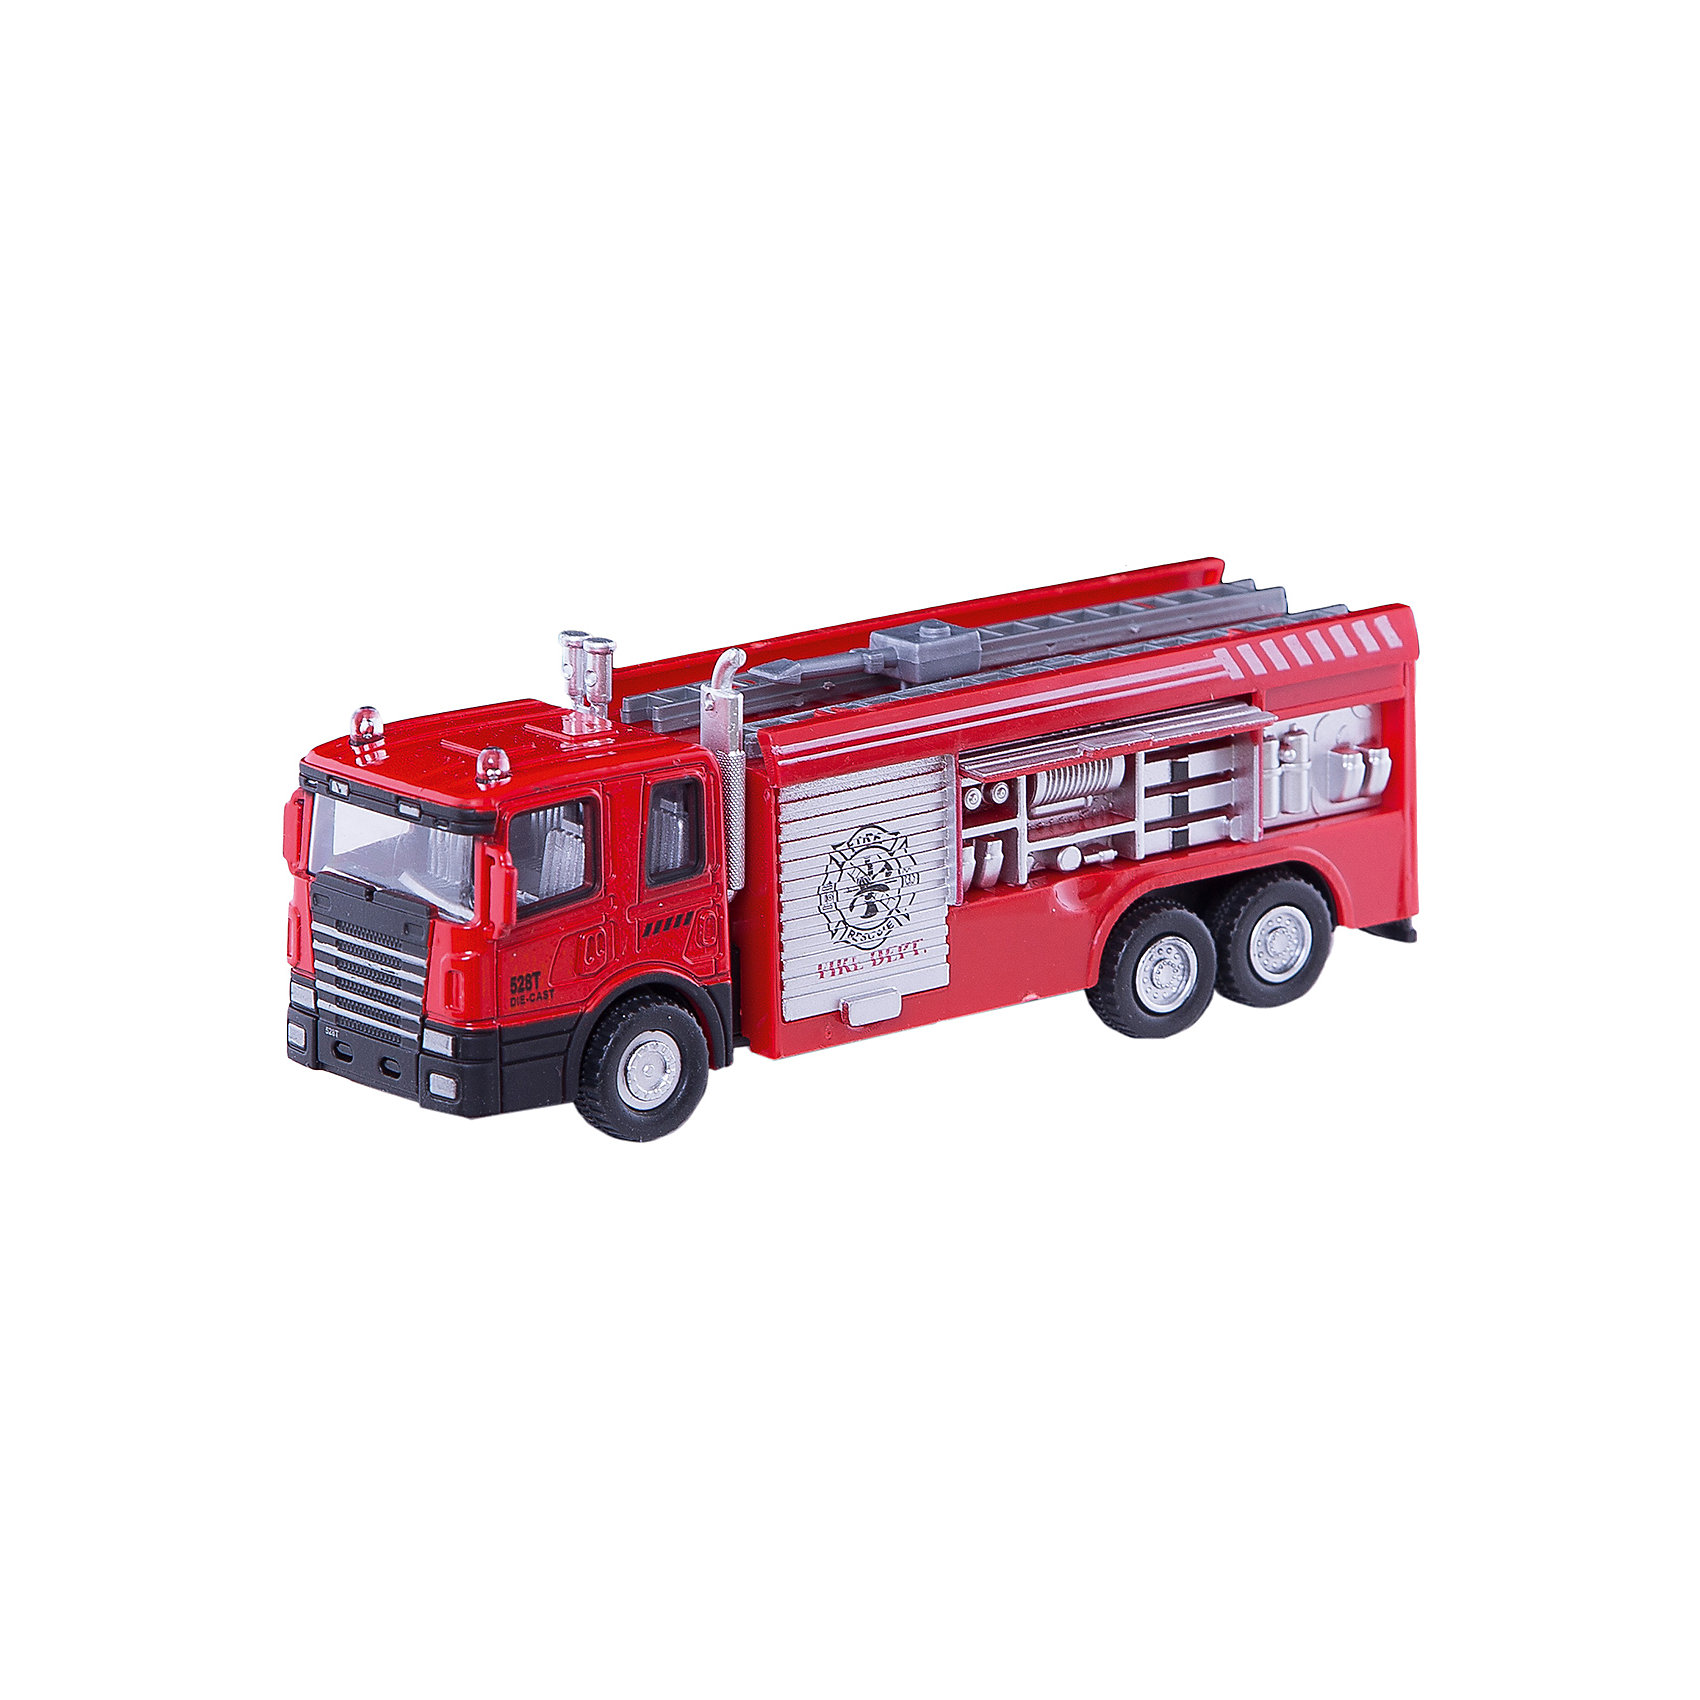 Машинка Fire Truck пожарная 1:48, AutotimeМашинки<br><br><br>Ширина мм: 165<br>Глубина мм: 57<br>Высота мм: 75<br>Вес г: 13<br>Возраст от месяцев: 36<br>Возраст до месяцев: 2147483647<br>Пол: Мужской<br>Возраст: Детский<br>SKU: 5584051